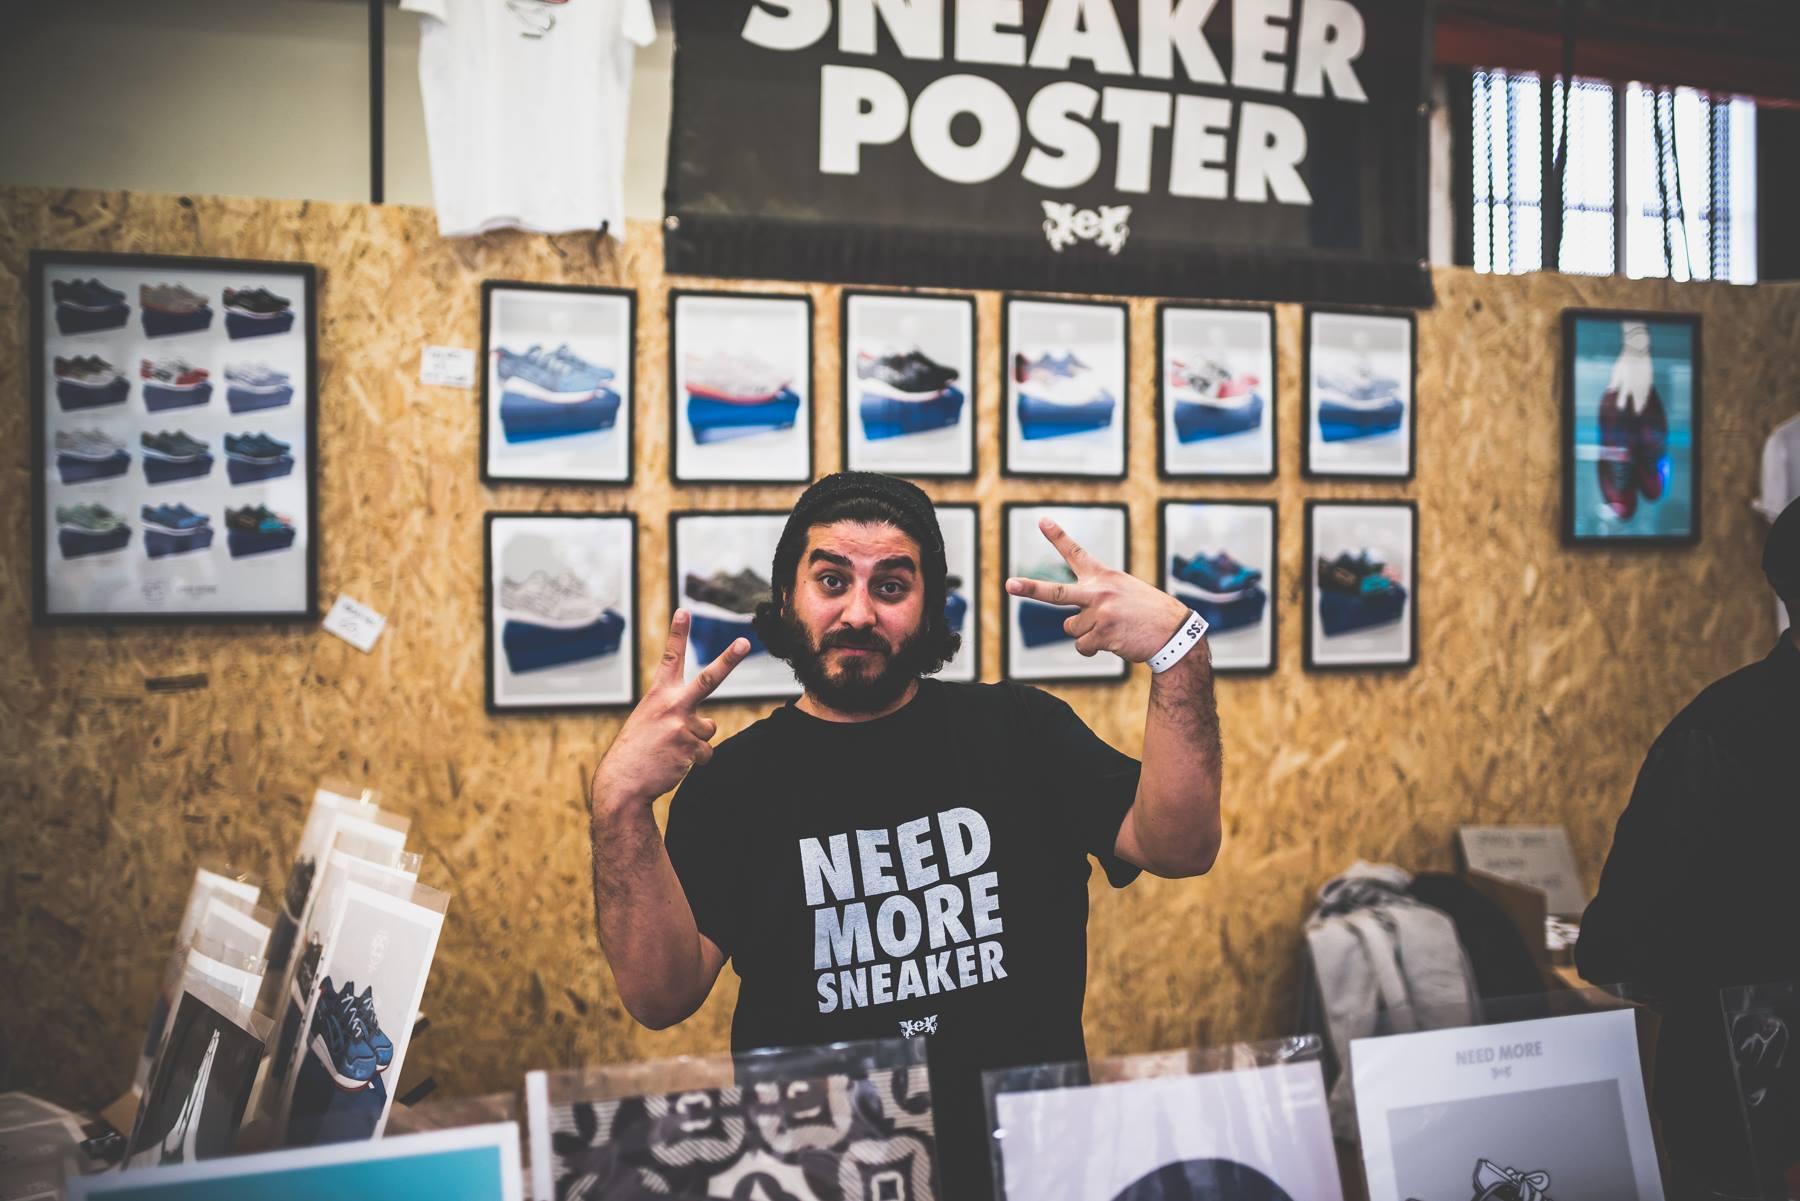 Wollen kaufen Sneakers? Bei #POPUP Sneakerness wird man fündig.